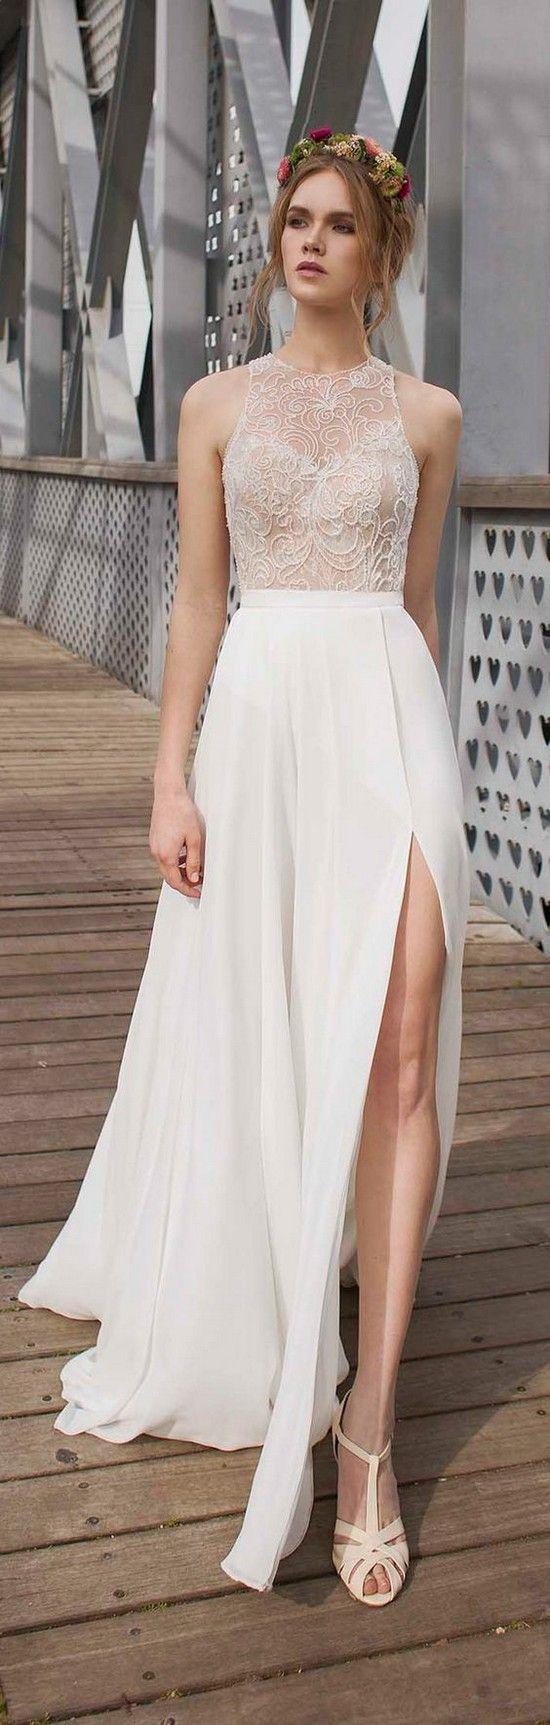 perfect wedding dress dress for a wedding 25 Best Ideas about Perfect Wedding Dress on Pinterest Pretty wedding dresses Weeding dresses and Princess wedding dresses